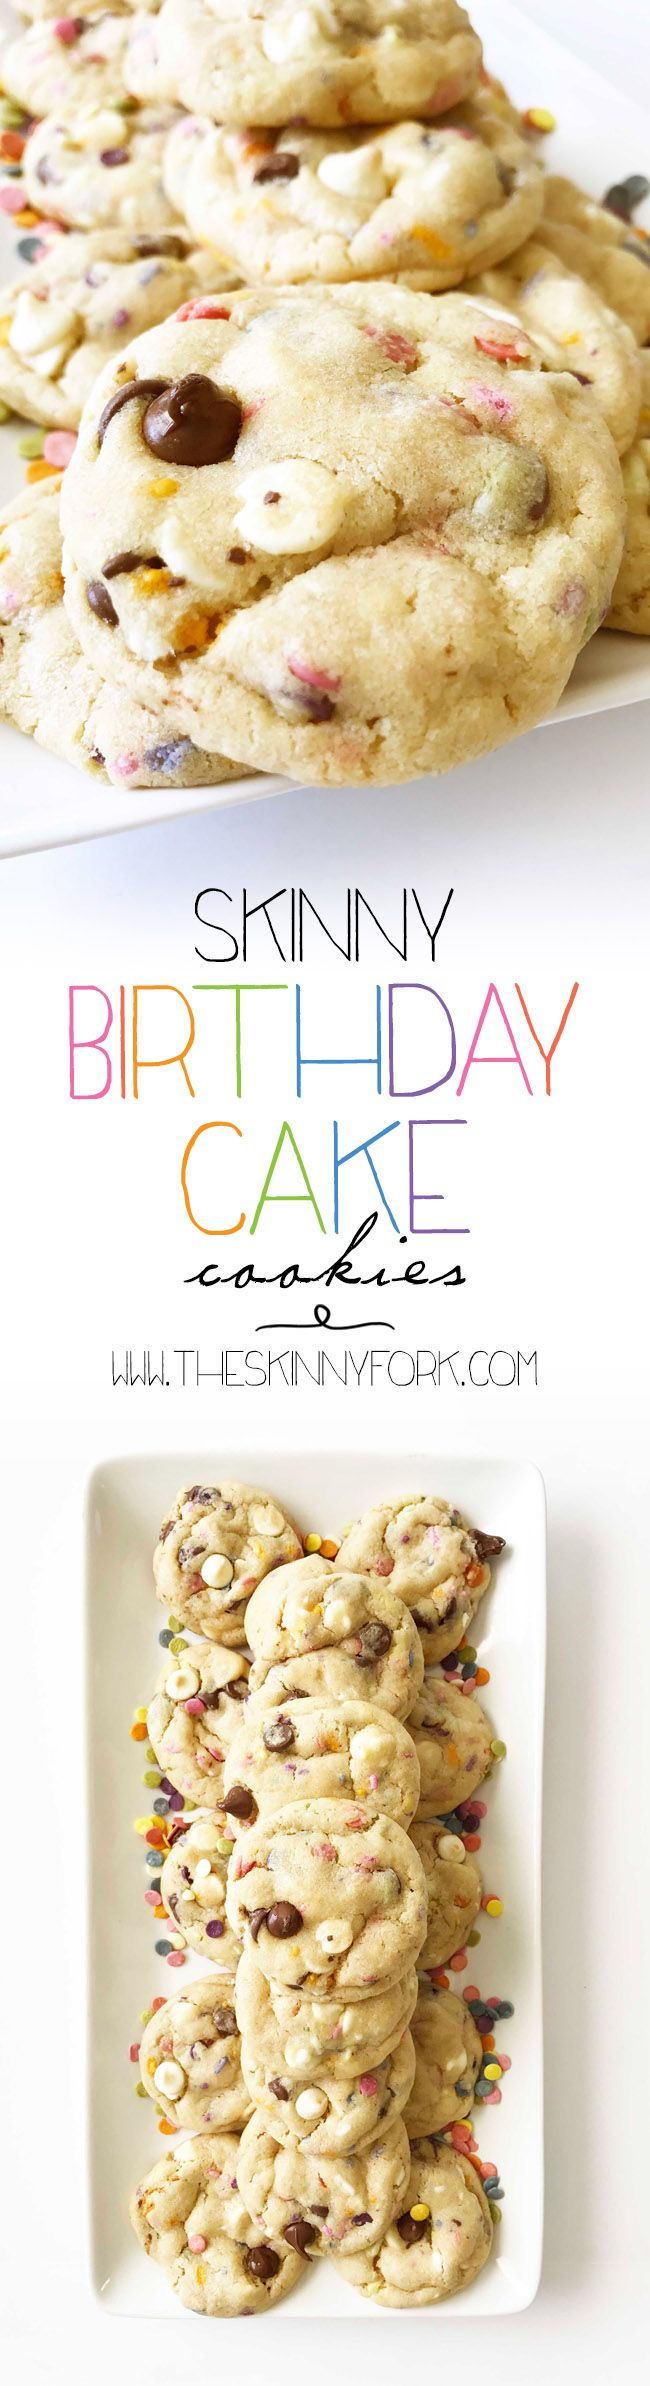 Skinny Birthday Cake Cake Batter Cookies Cake batter cookies